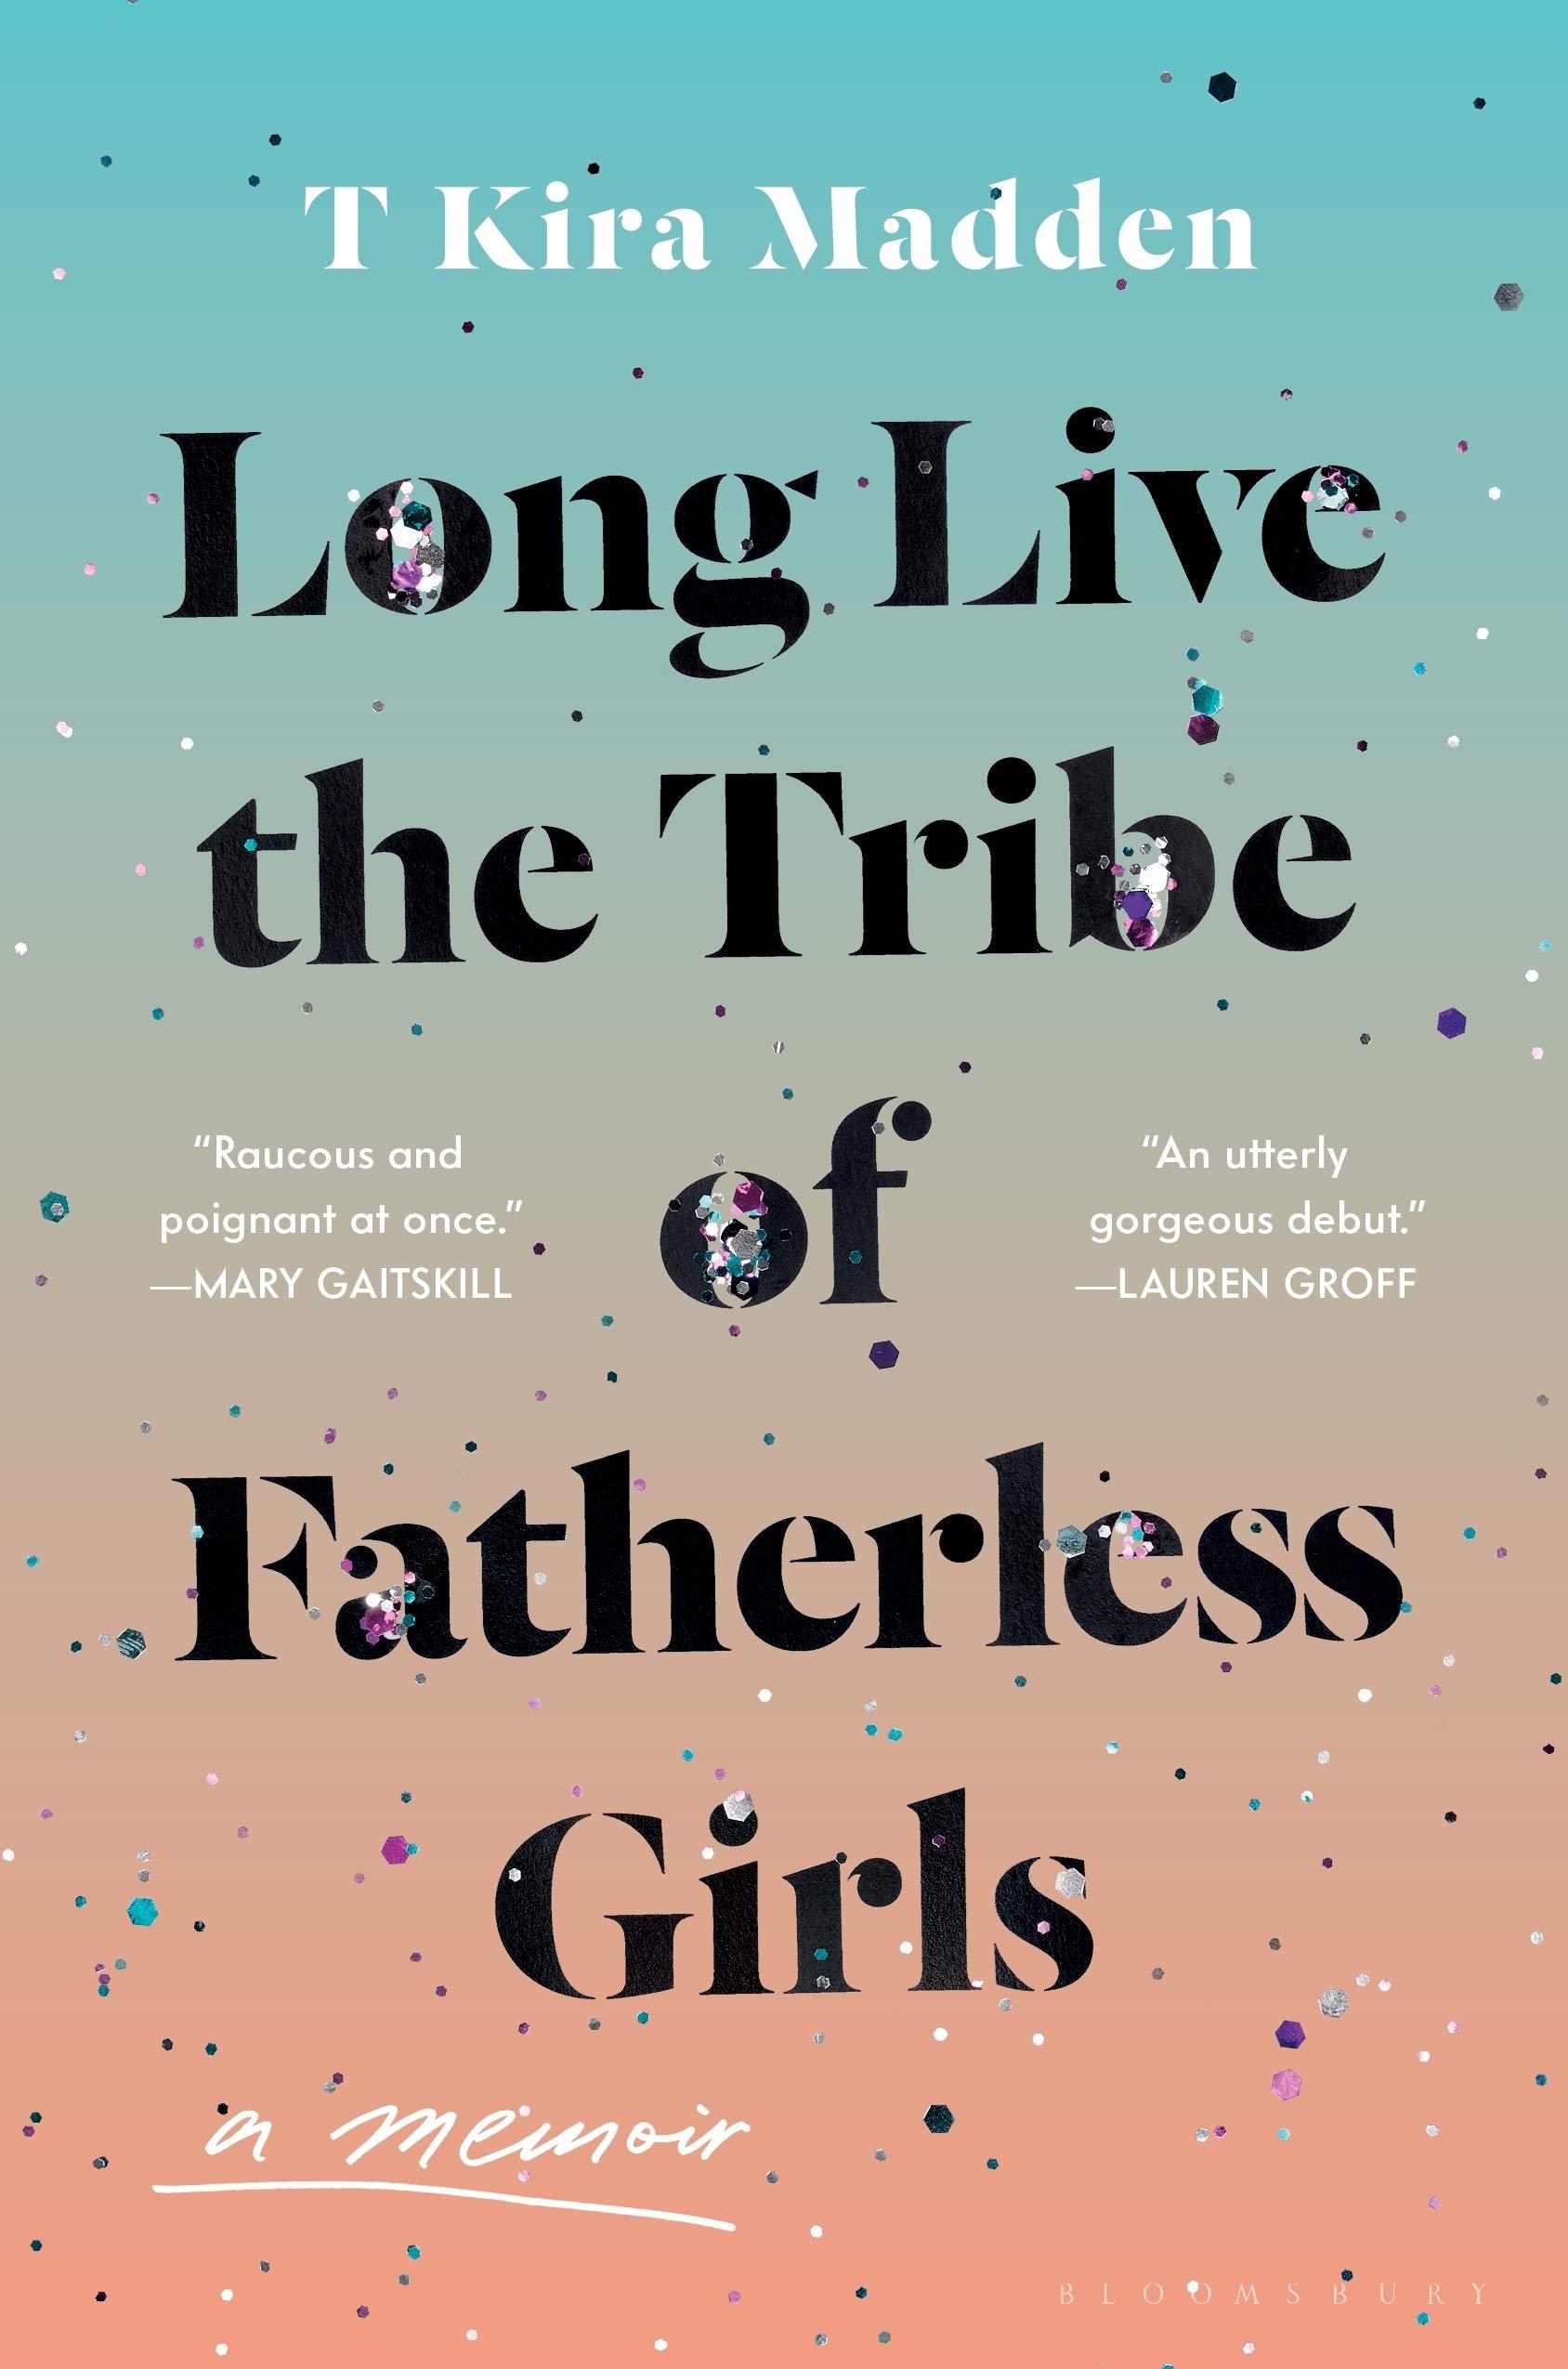 Long Live the Tribe of Fatherless Girls: A Memoir: Madden, T Kira:  9781635571851: Amazon.com: Books